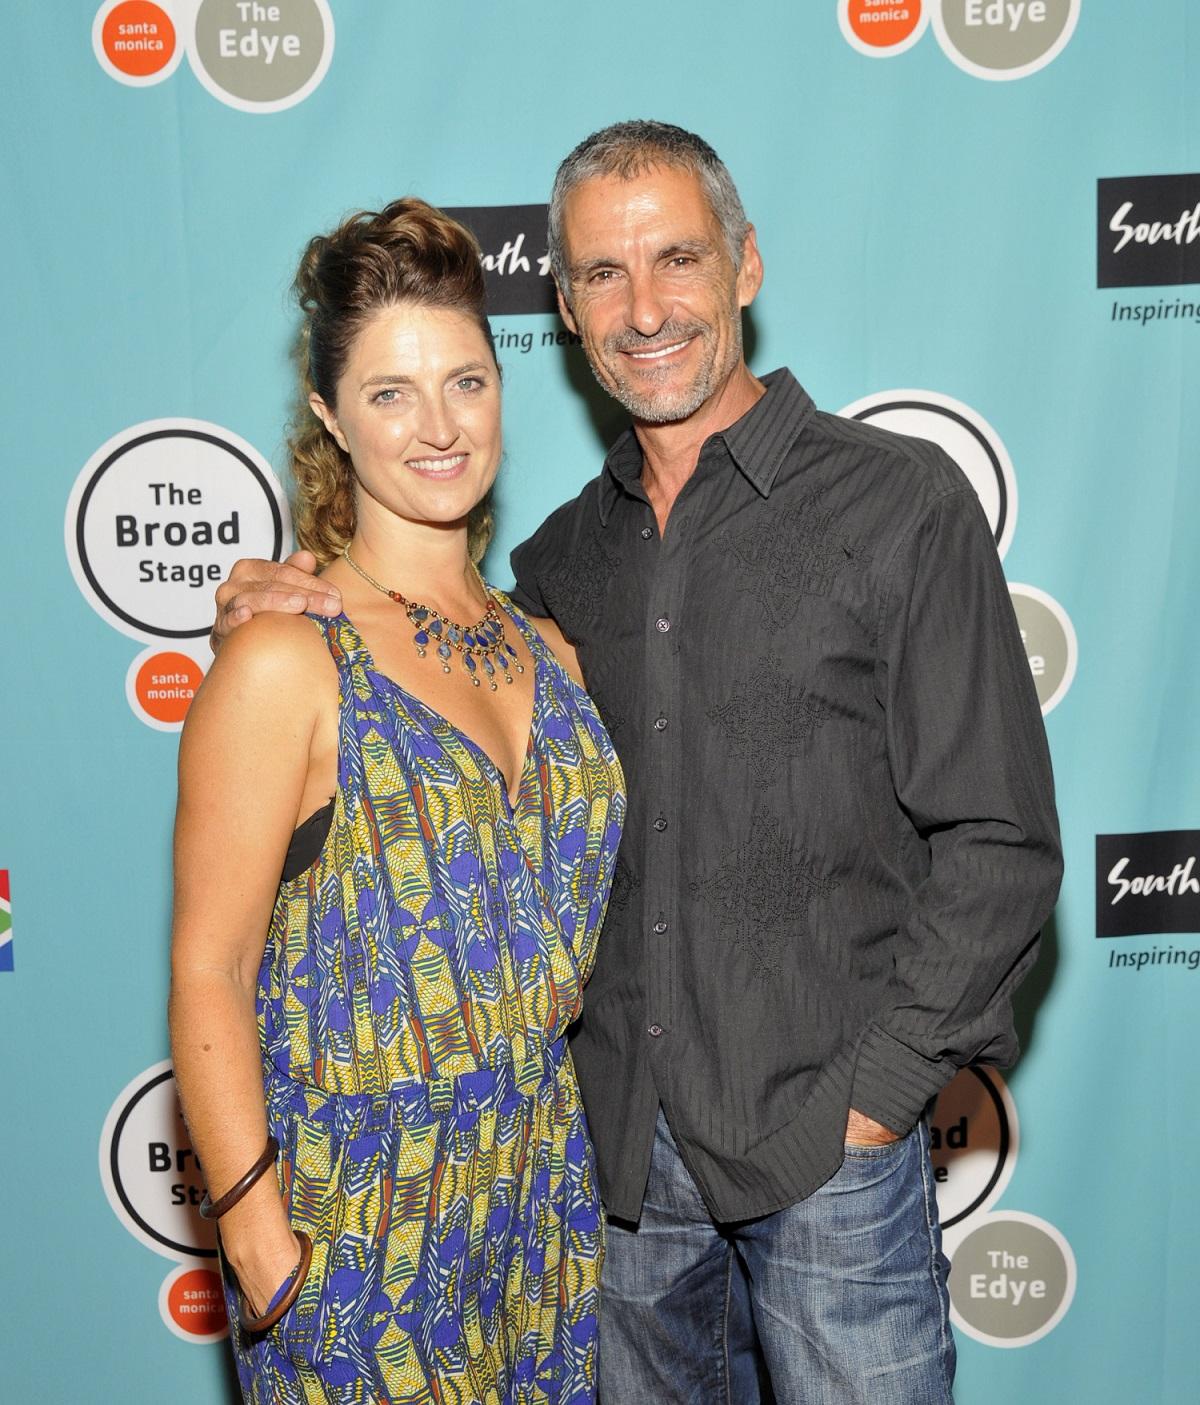 Colette Simon and Cliff Simon, who played Ba'al on Stargate SG-1